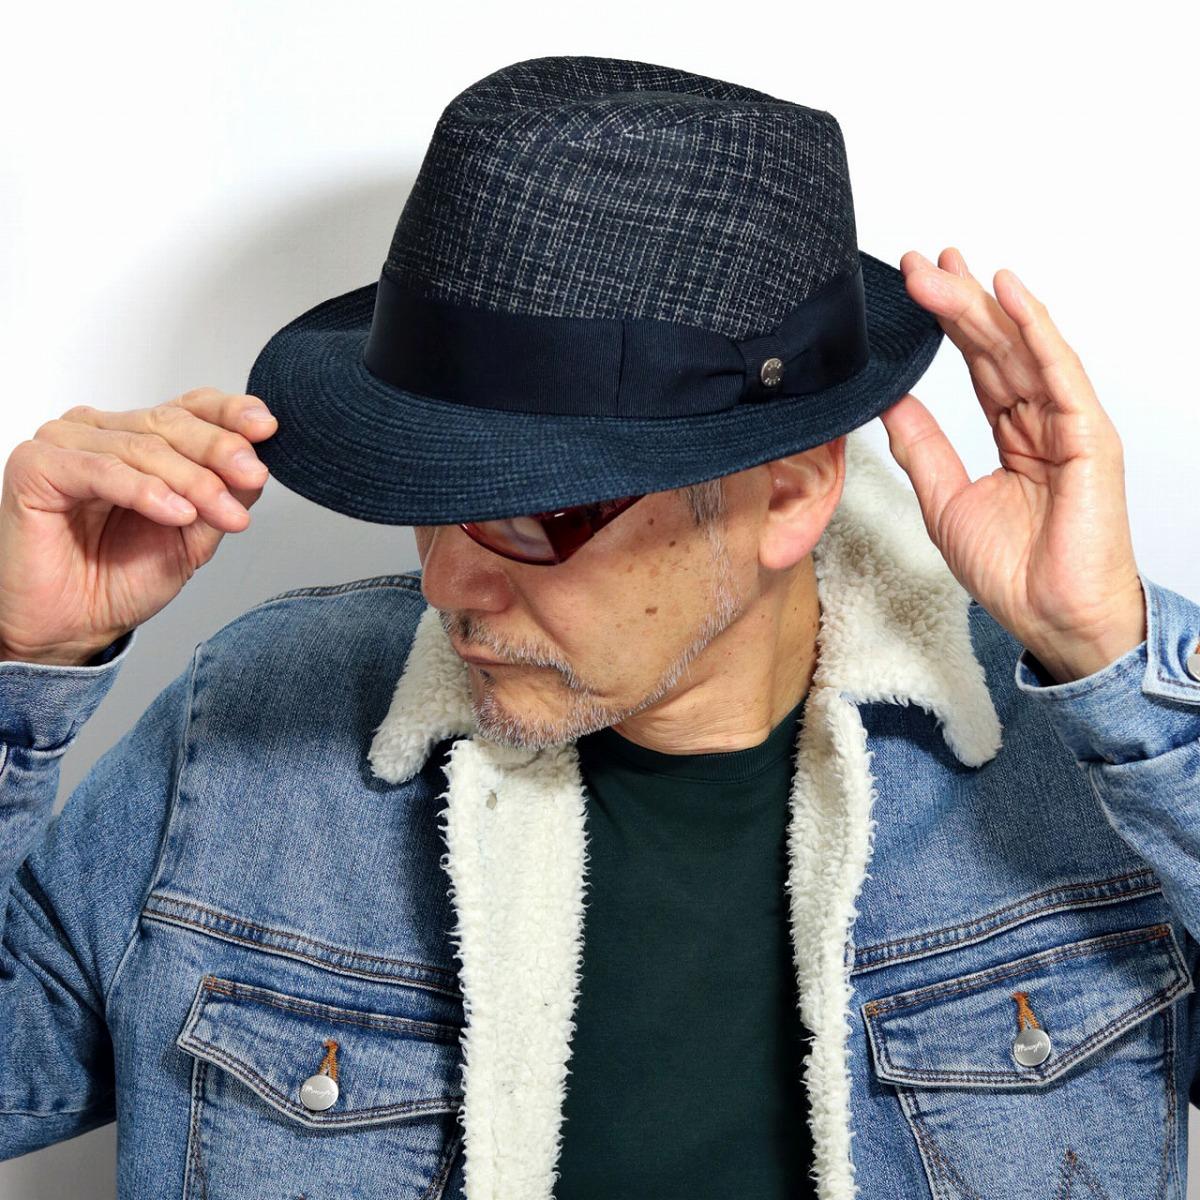 DAKS 中折れハット セントポール型 チェック 帽子 中折れ ダックス 秋冬 メンズ チェック柄 小物 中折れ帽子 紳士 暖かい 秋 冬 帽子 柄物 グログランリボン サイズ調整可能 紺 ネイビー[ fedora ]送料無料 男性 誕生日 帽子 父の日 ギフト プレゼント